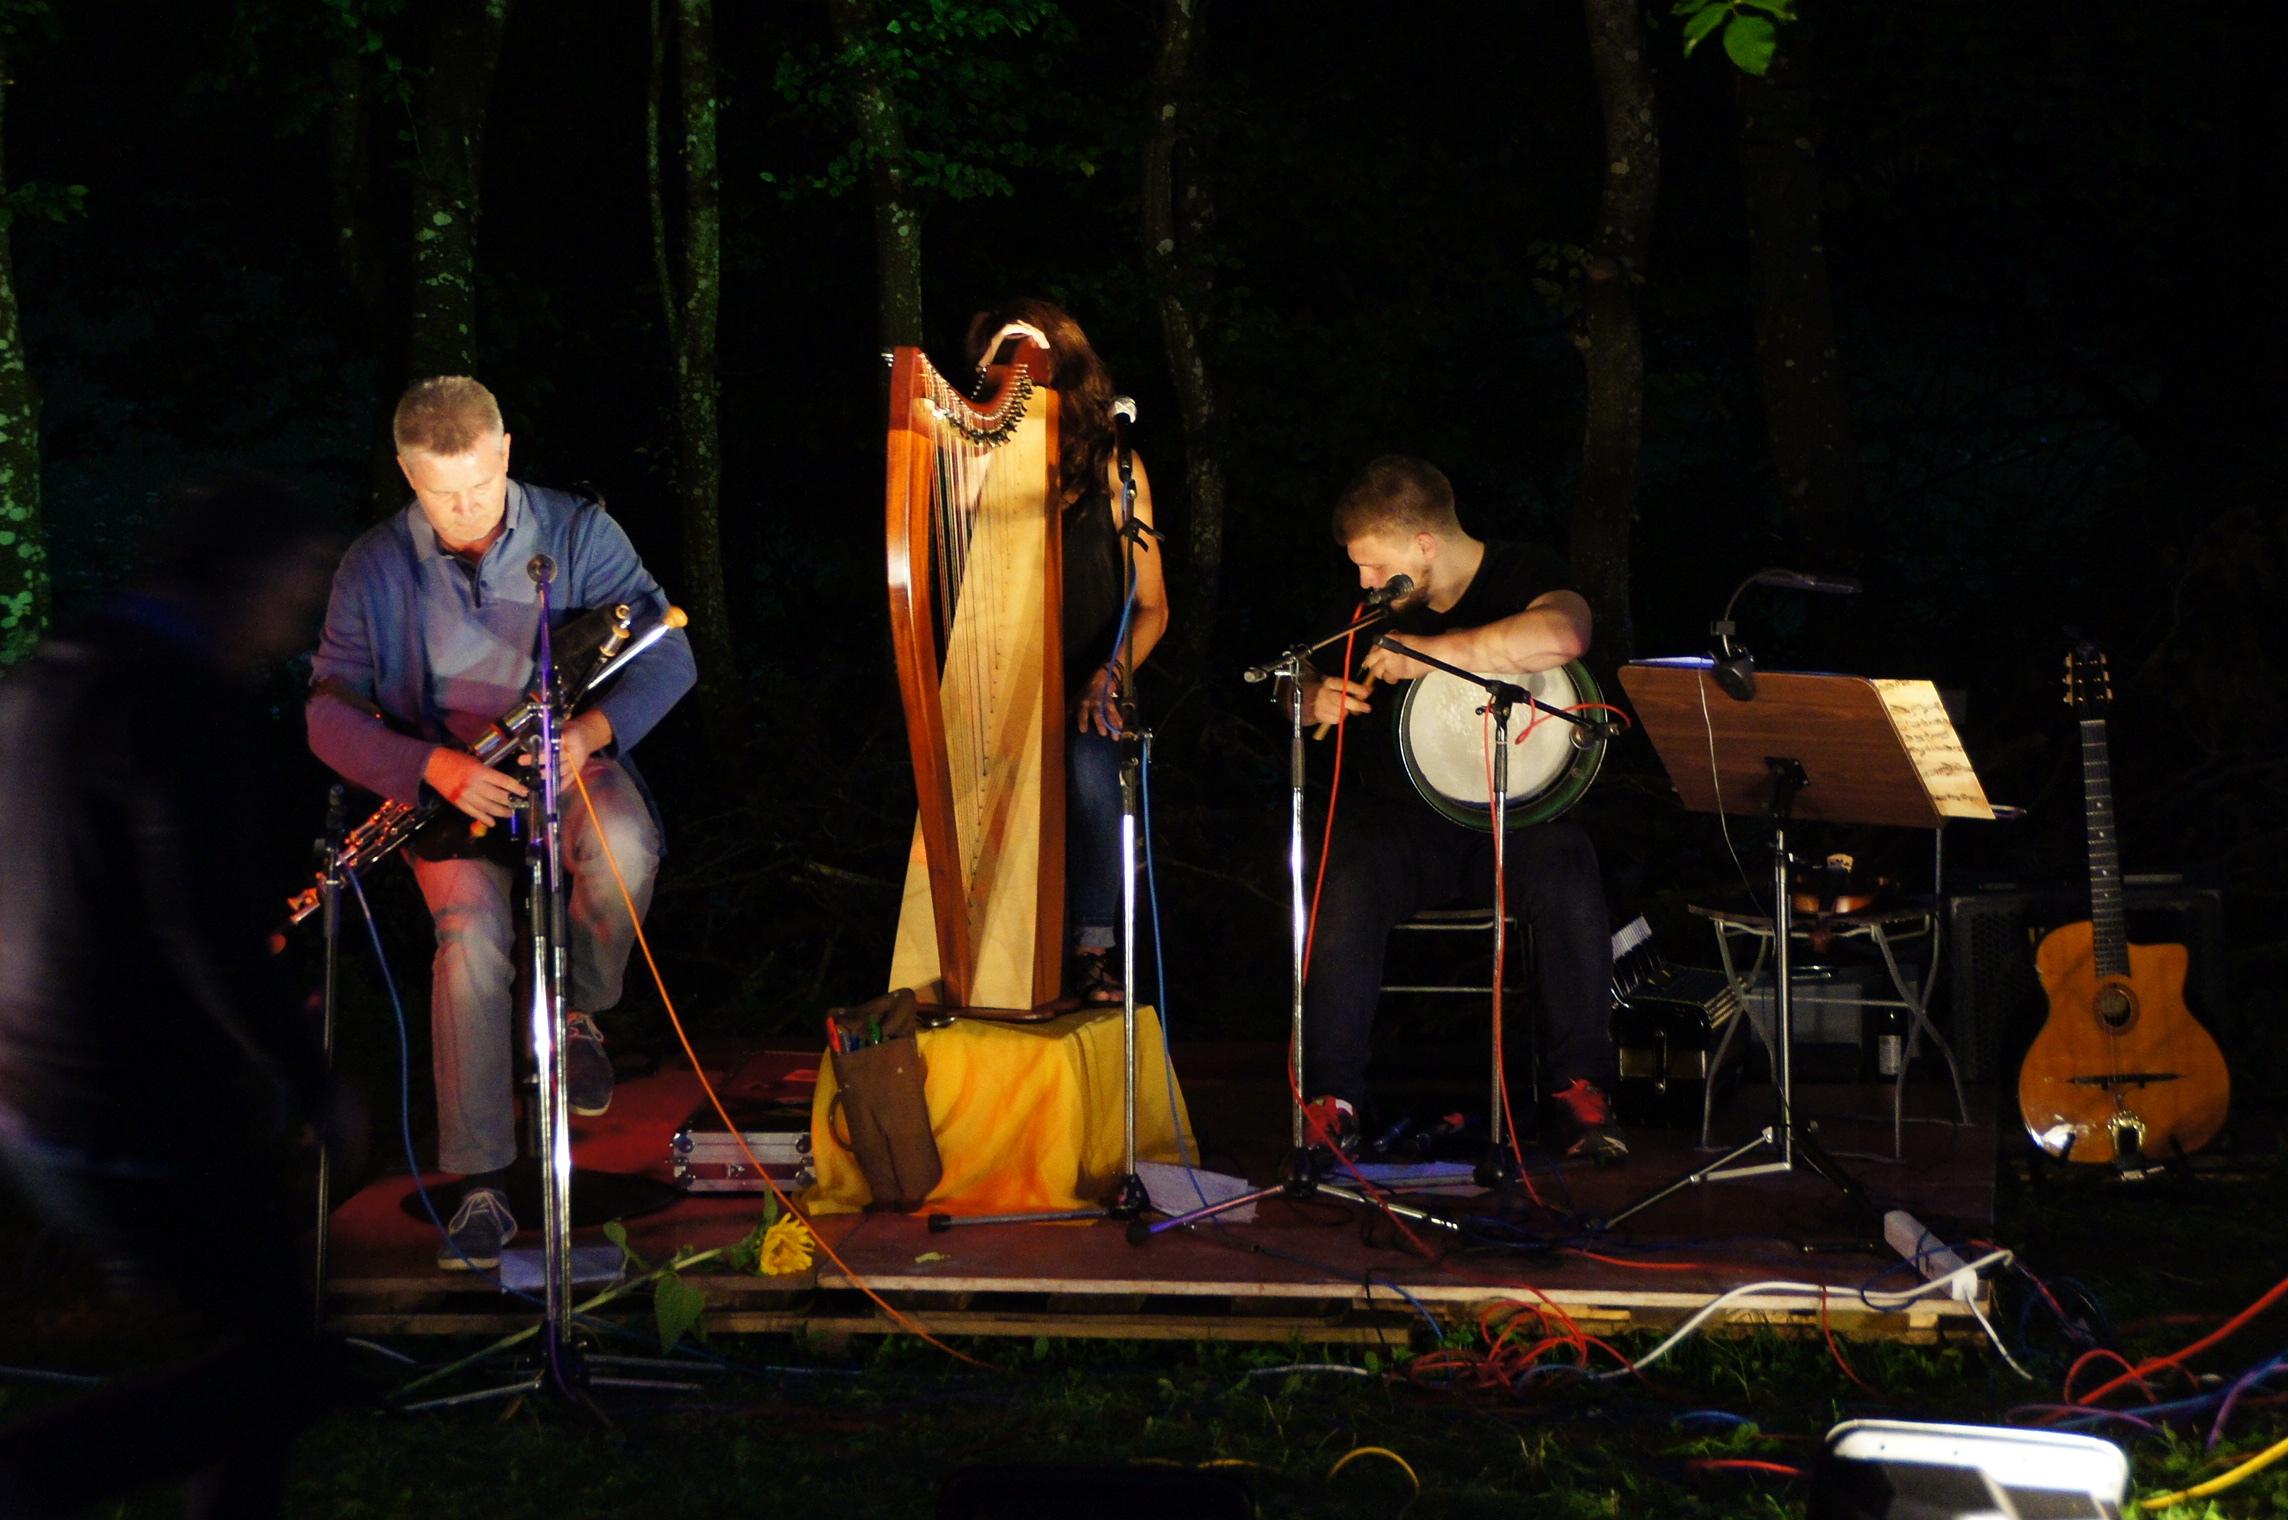 34 2016_08 Sommerfest Liederfest kleinj.jpg